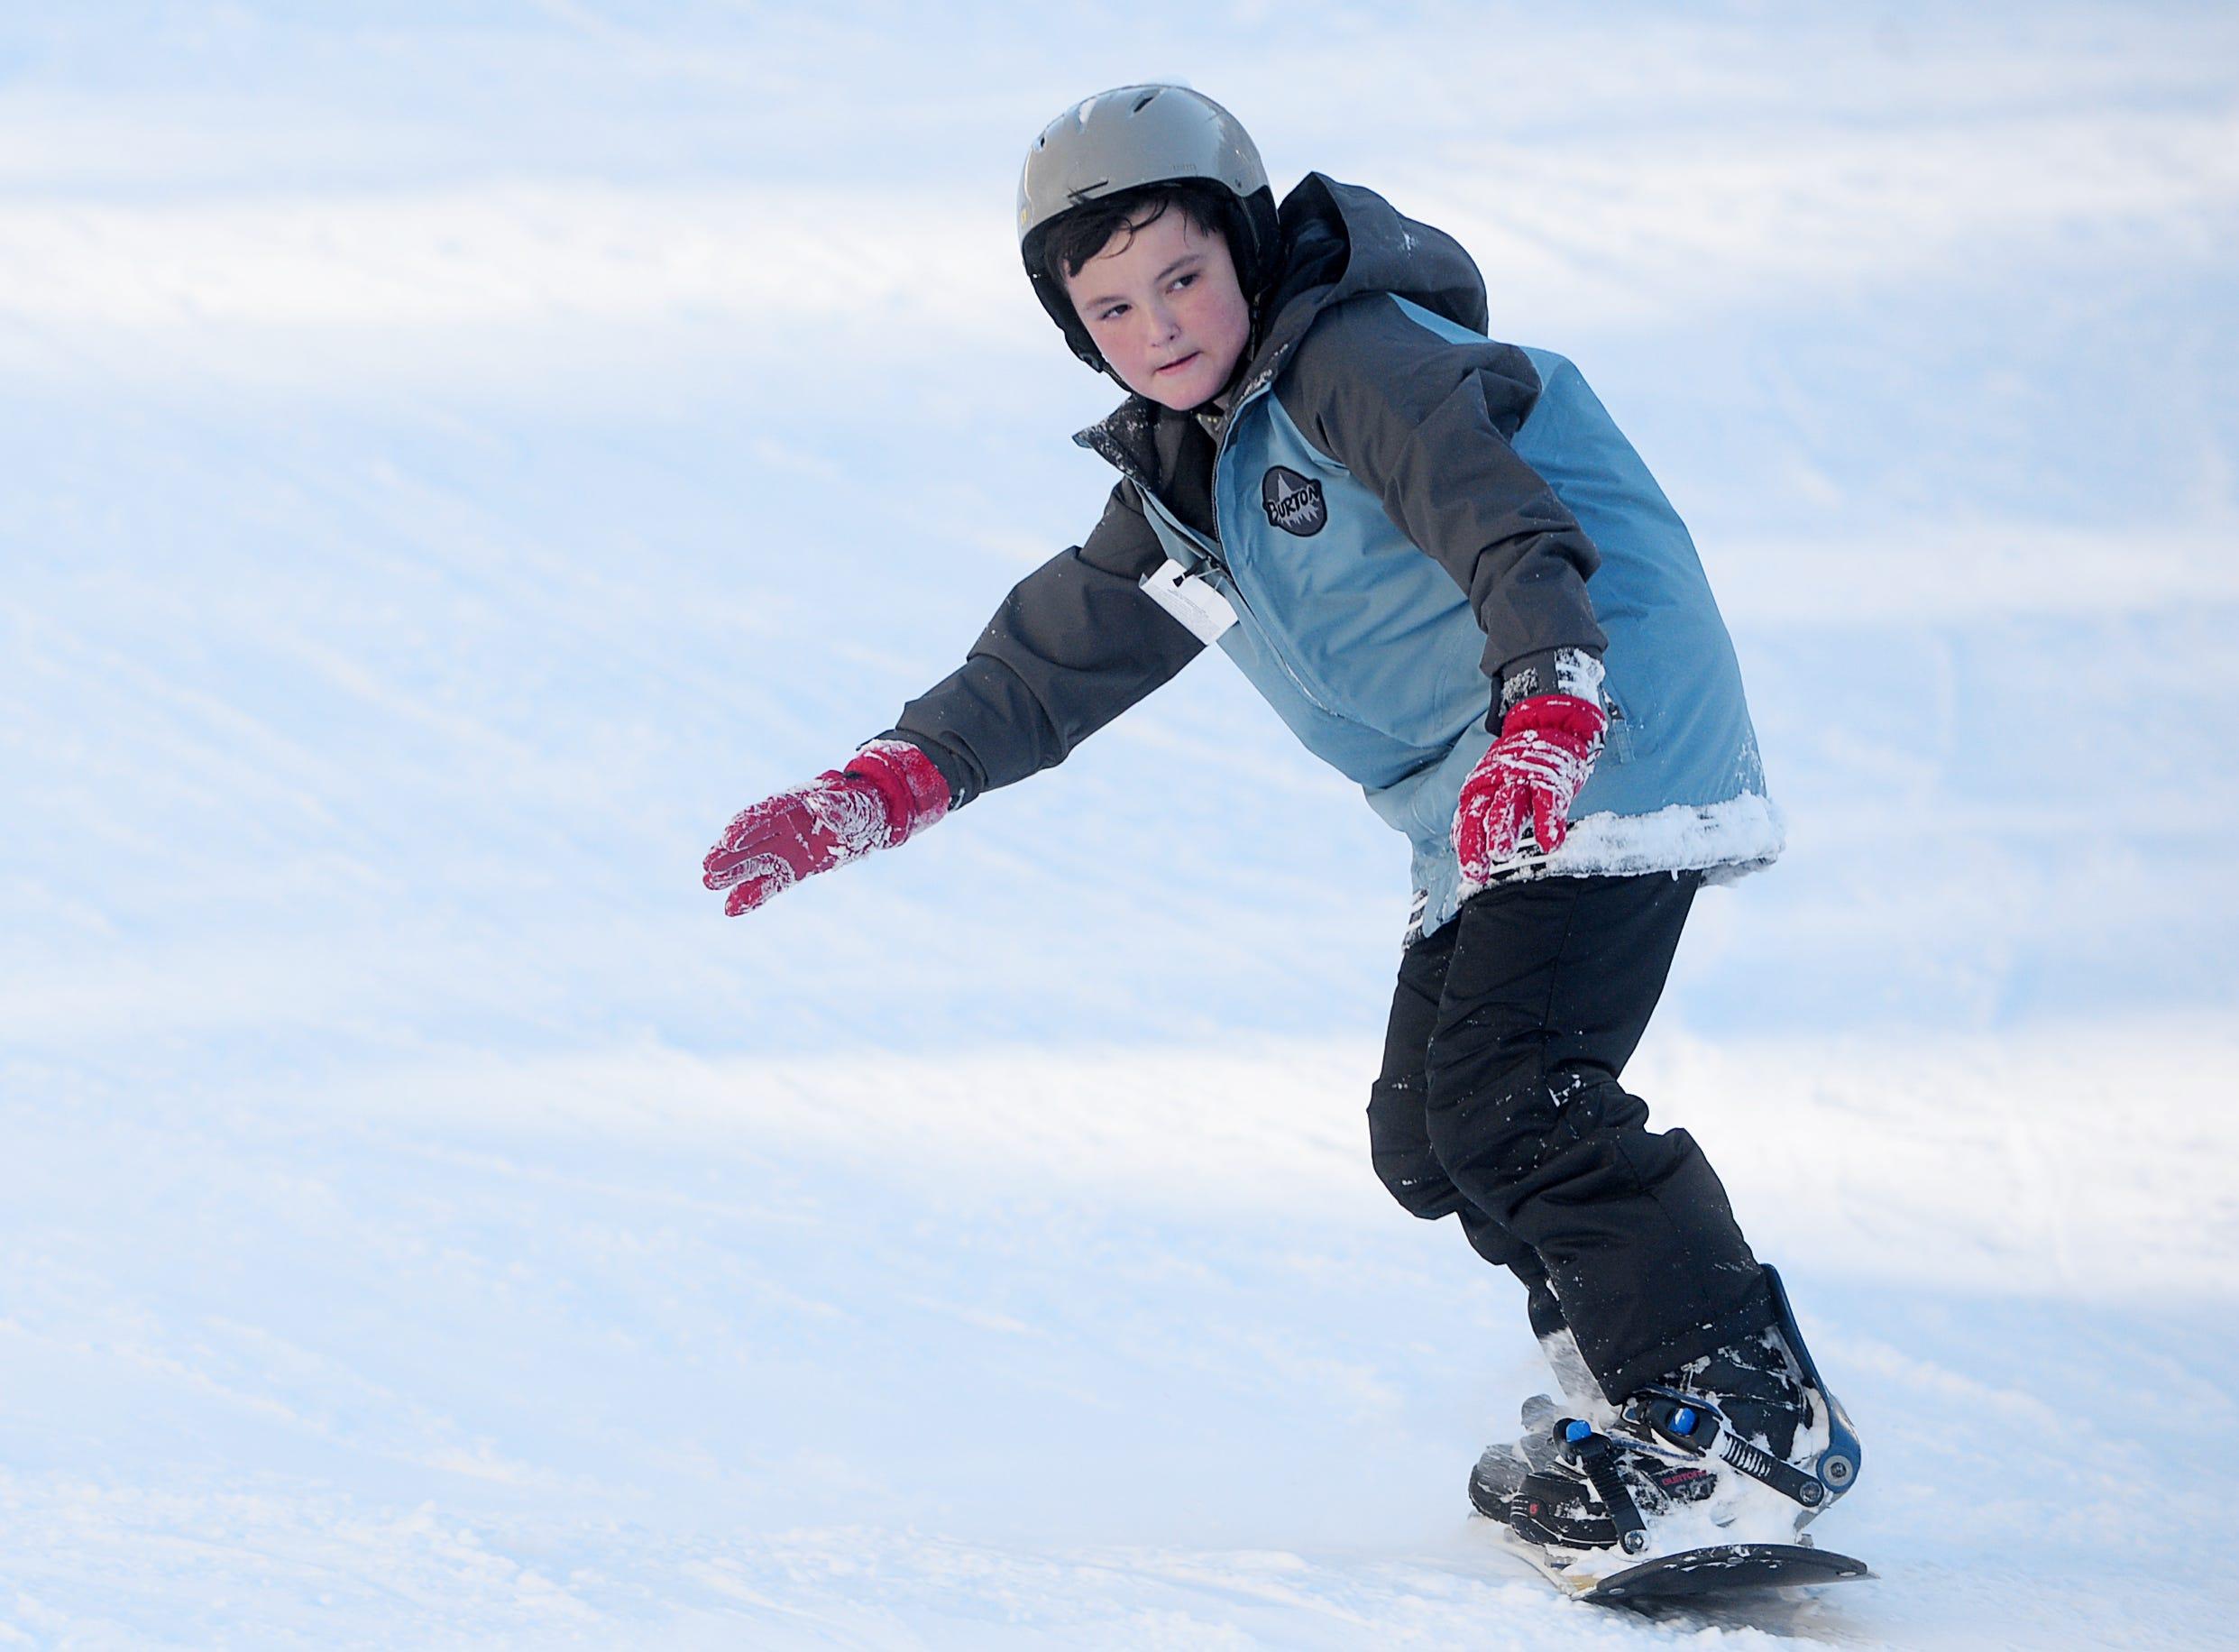 Skiers and snowboarders enjoyed fresh powder at Wolf Ridge Ski Resort in Mars Hill Dec. 22, 2018.